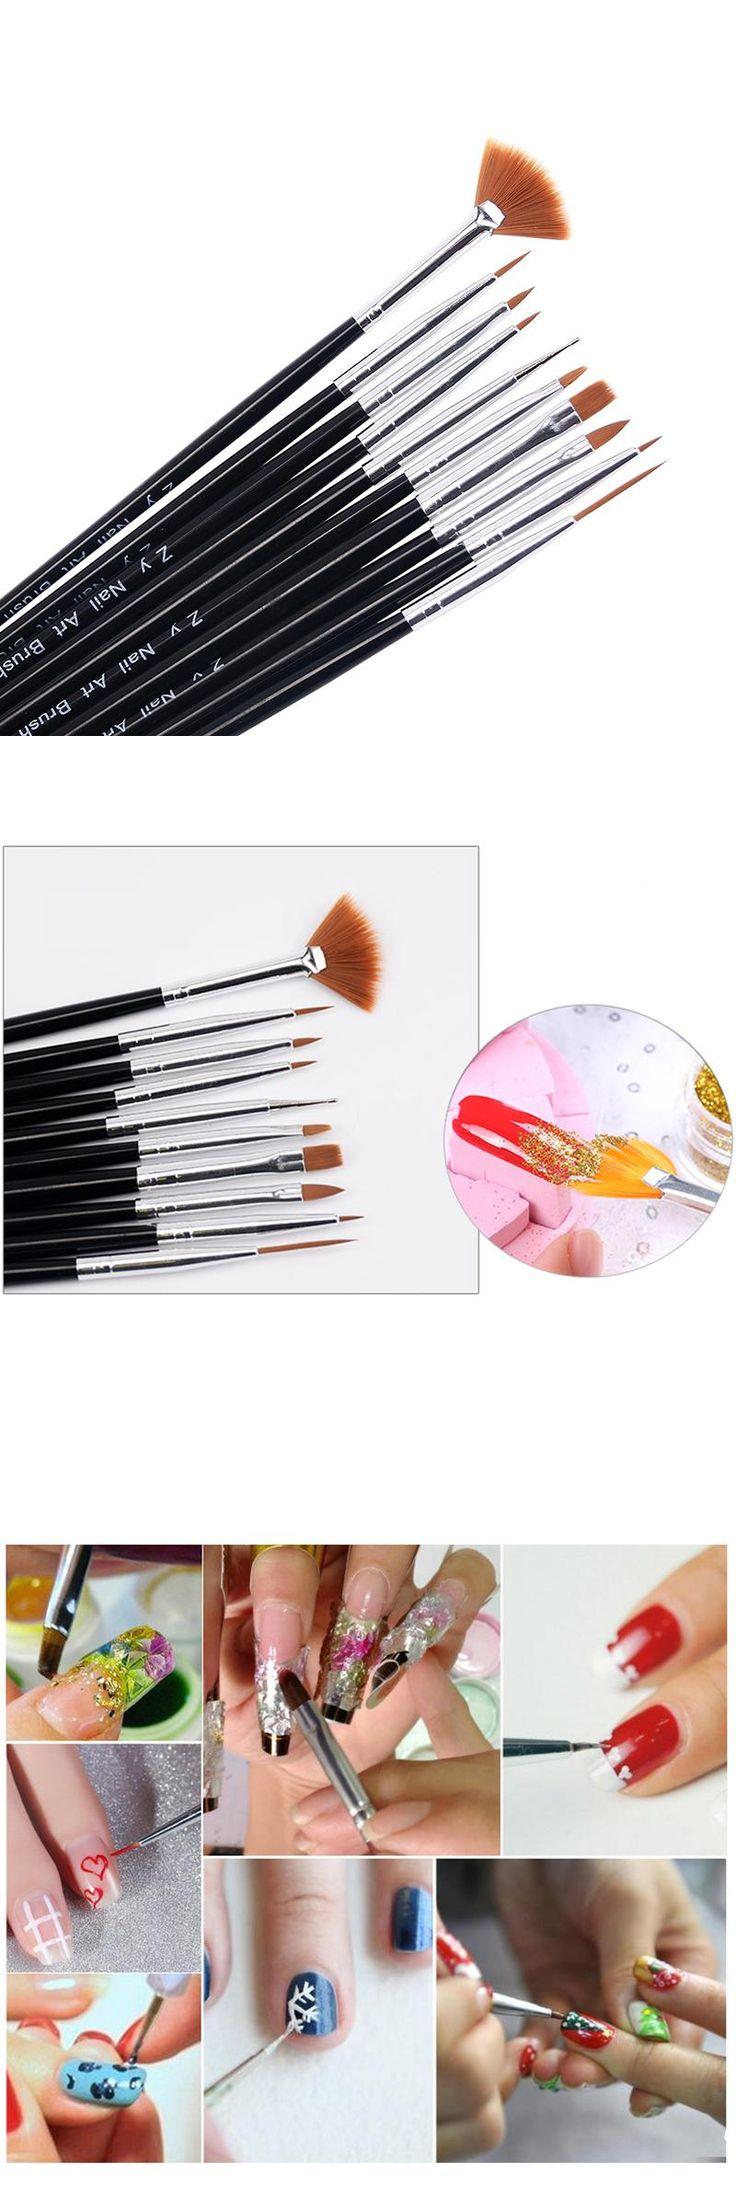 [Visit to Buy] 10pcs/pack Kolinsky Acrylic French Nail Art Liner Brushes Drawing Dotting Nail Brush Manicure Pen Styling Tools #Advertisement